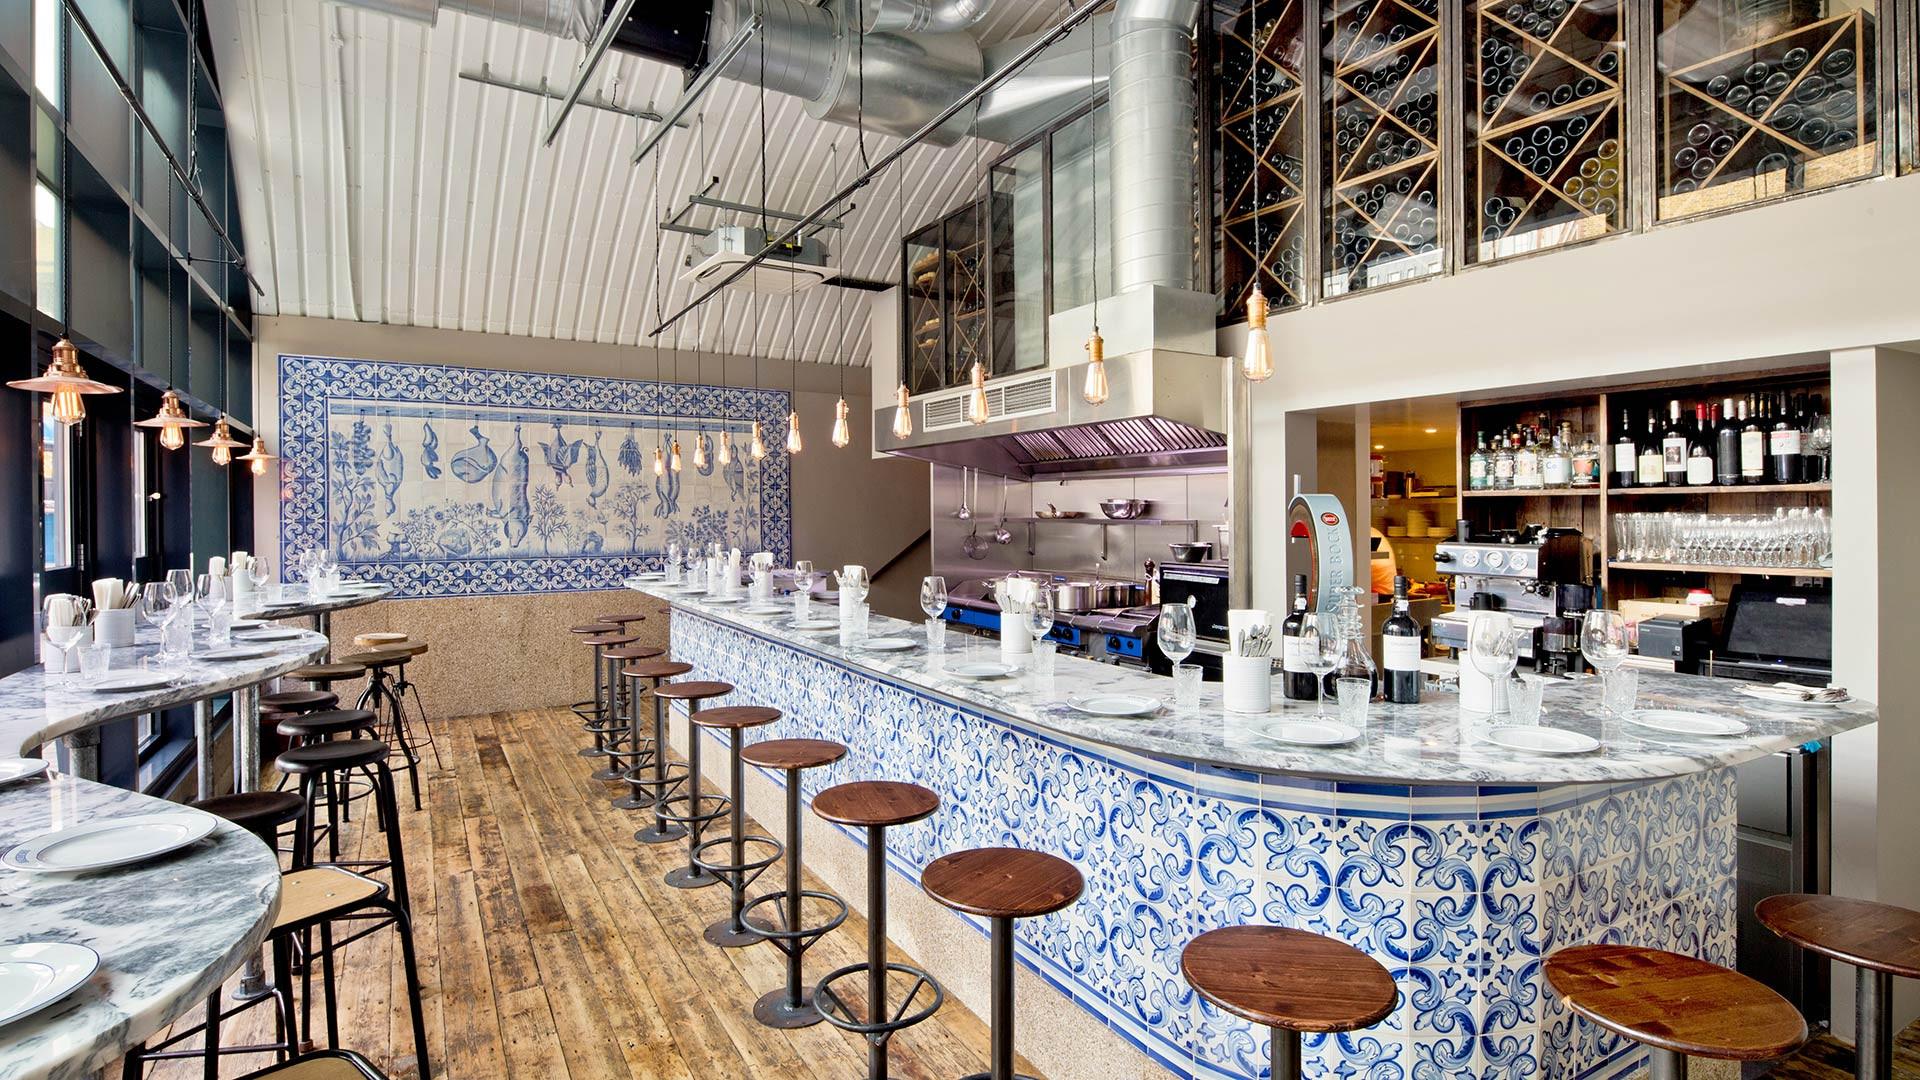 The counter at Bar Douro